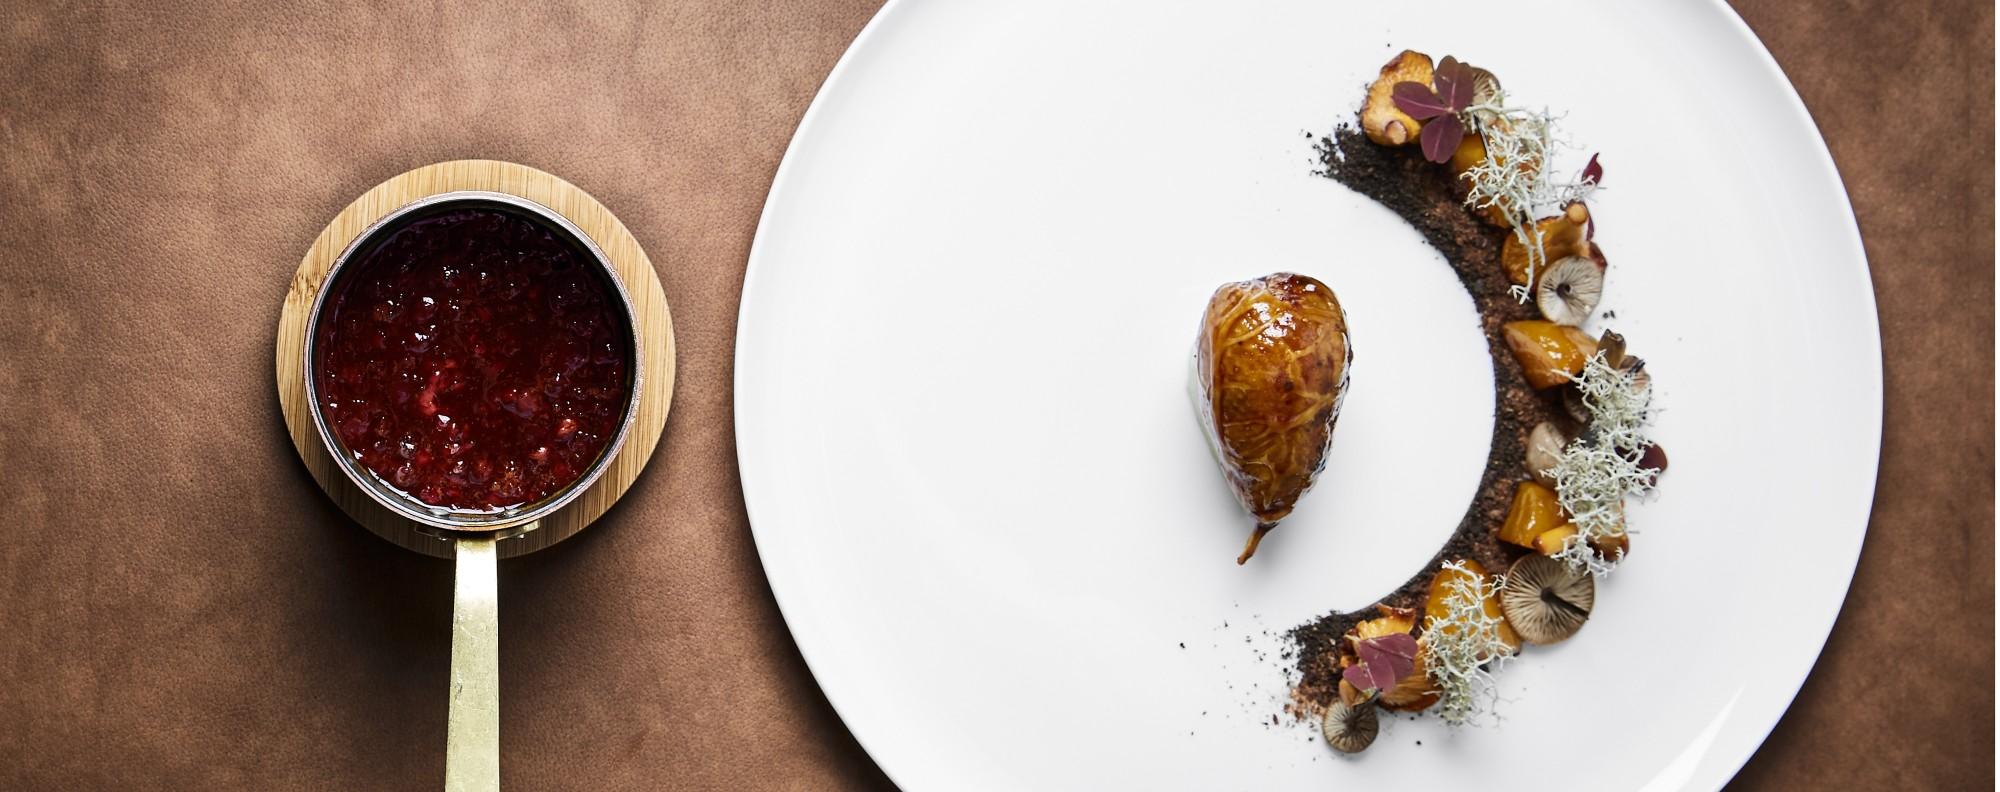 Cuisine style kori sukka mangalore style dry chicken - Cuisine style nordique ...